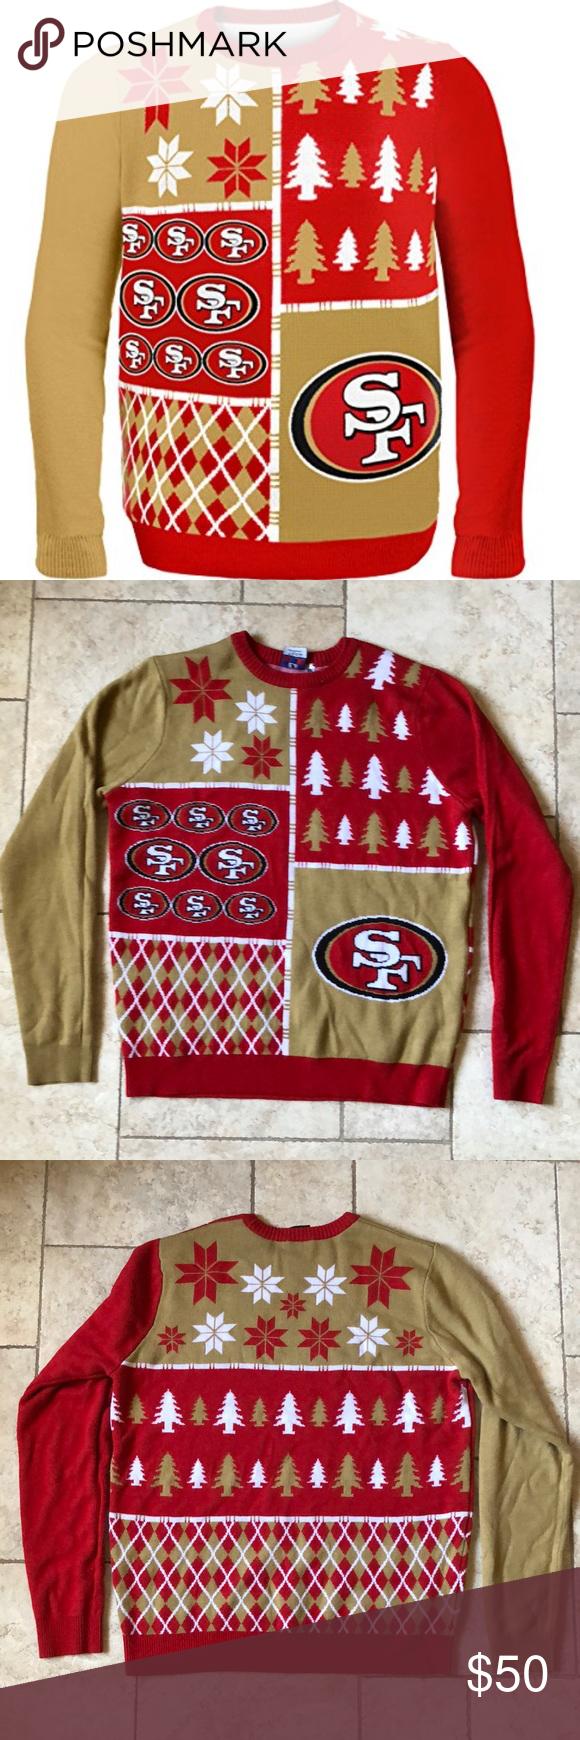 Sf 49ers Ugly Christmas Sweater Ugliest Christmas Sweaters Retail